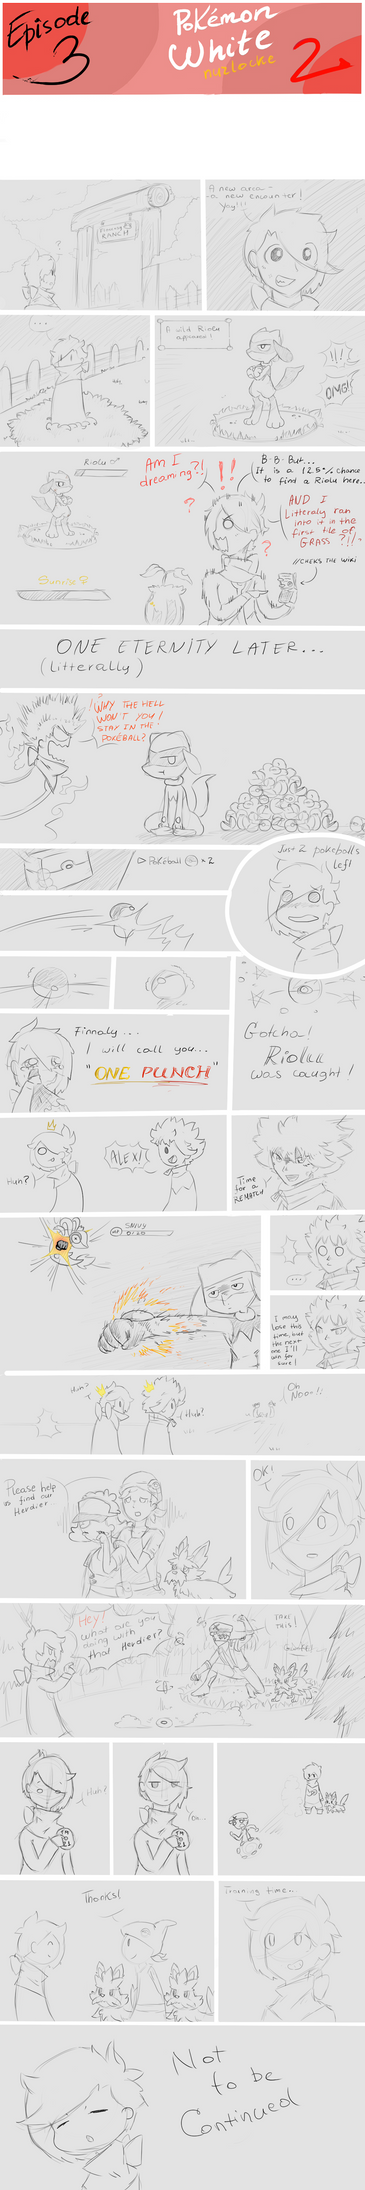 Pokemon nuzlocke ep 3 by ChocoDoze